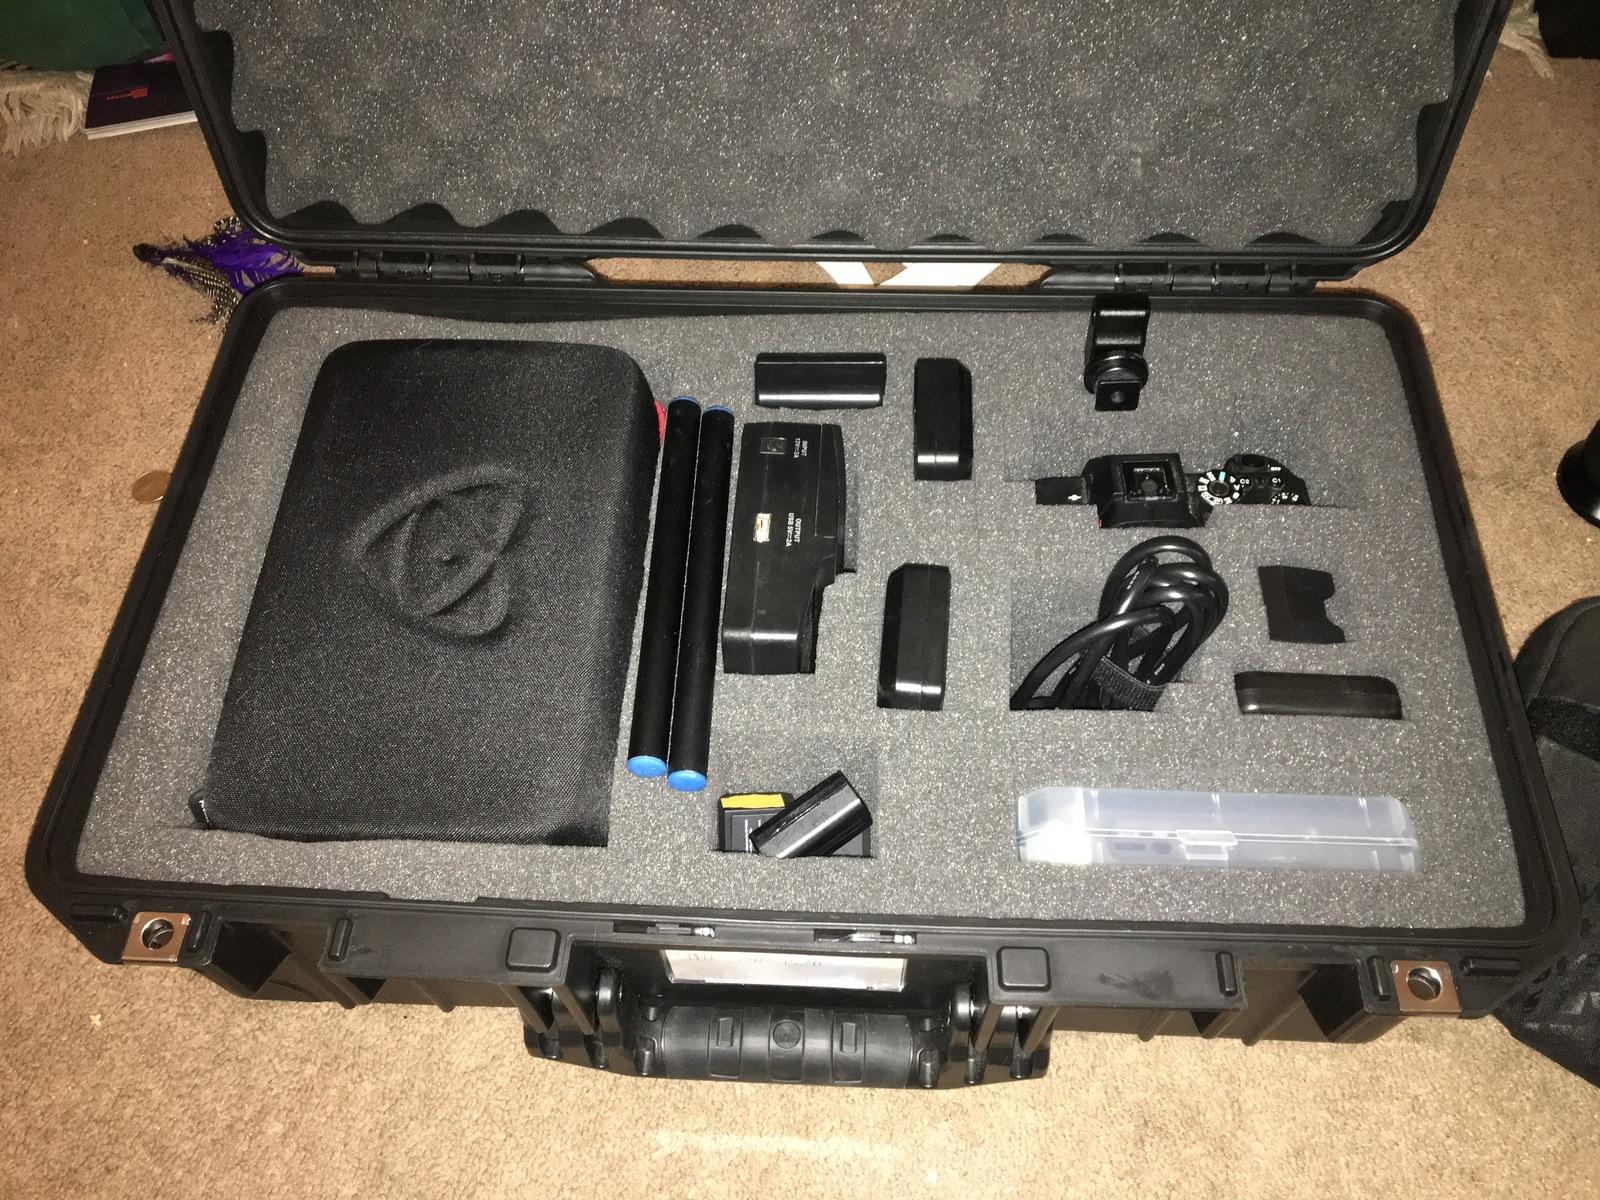 Sony recorder seattle 100 3